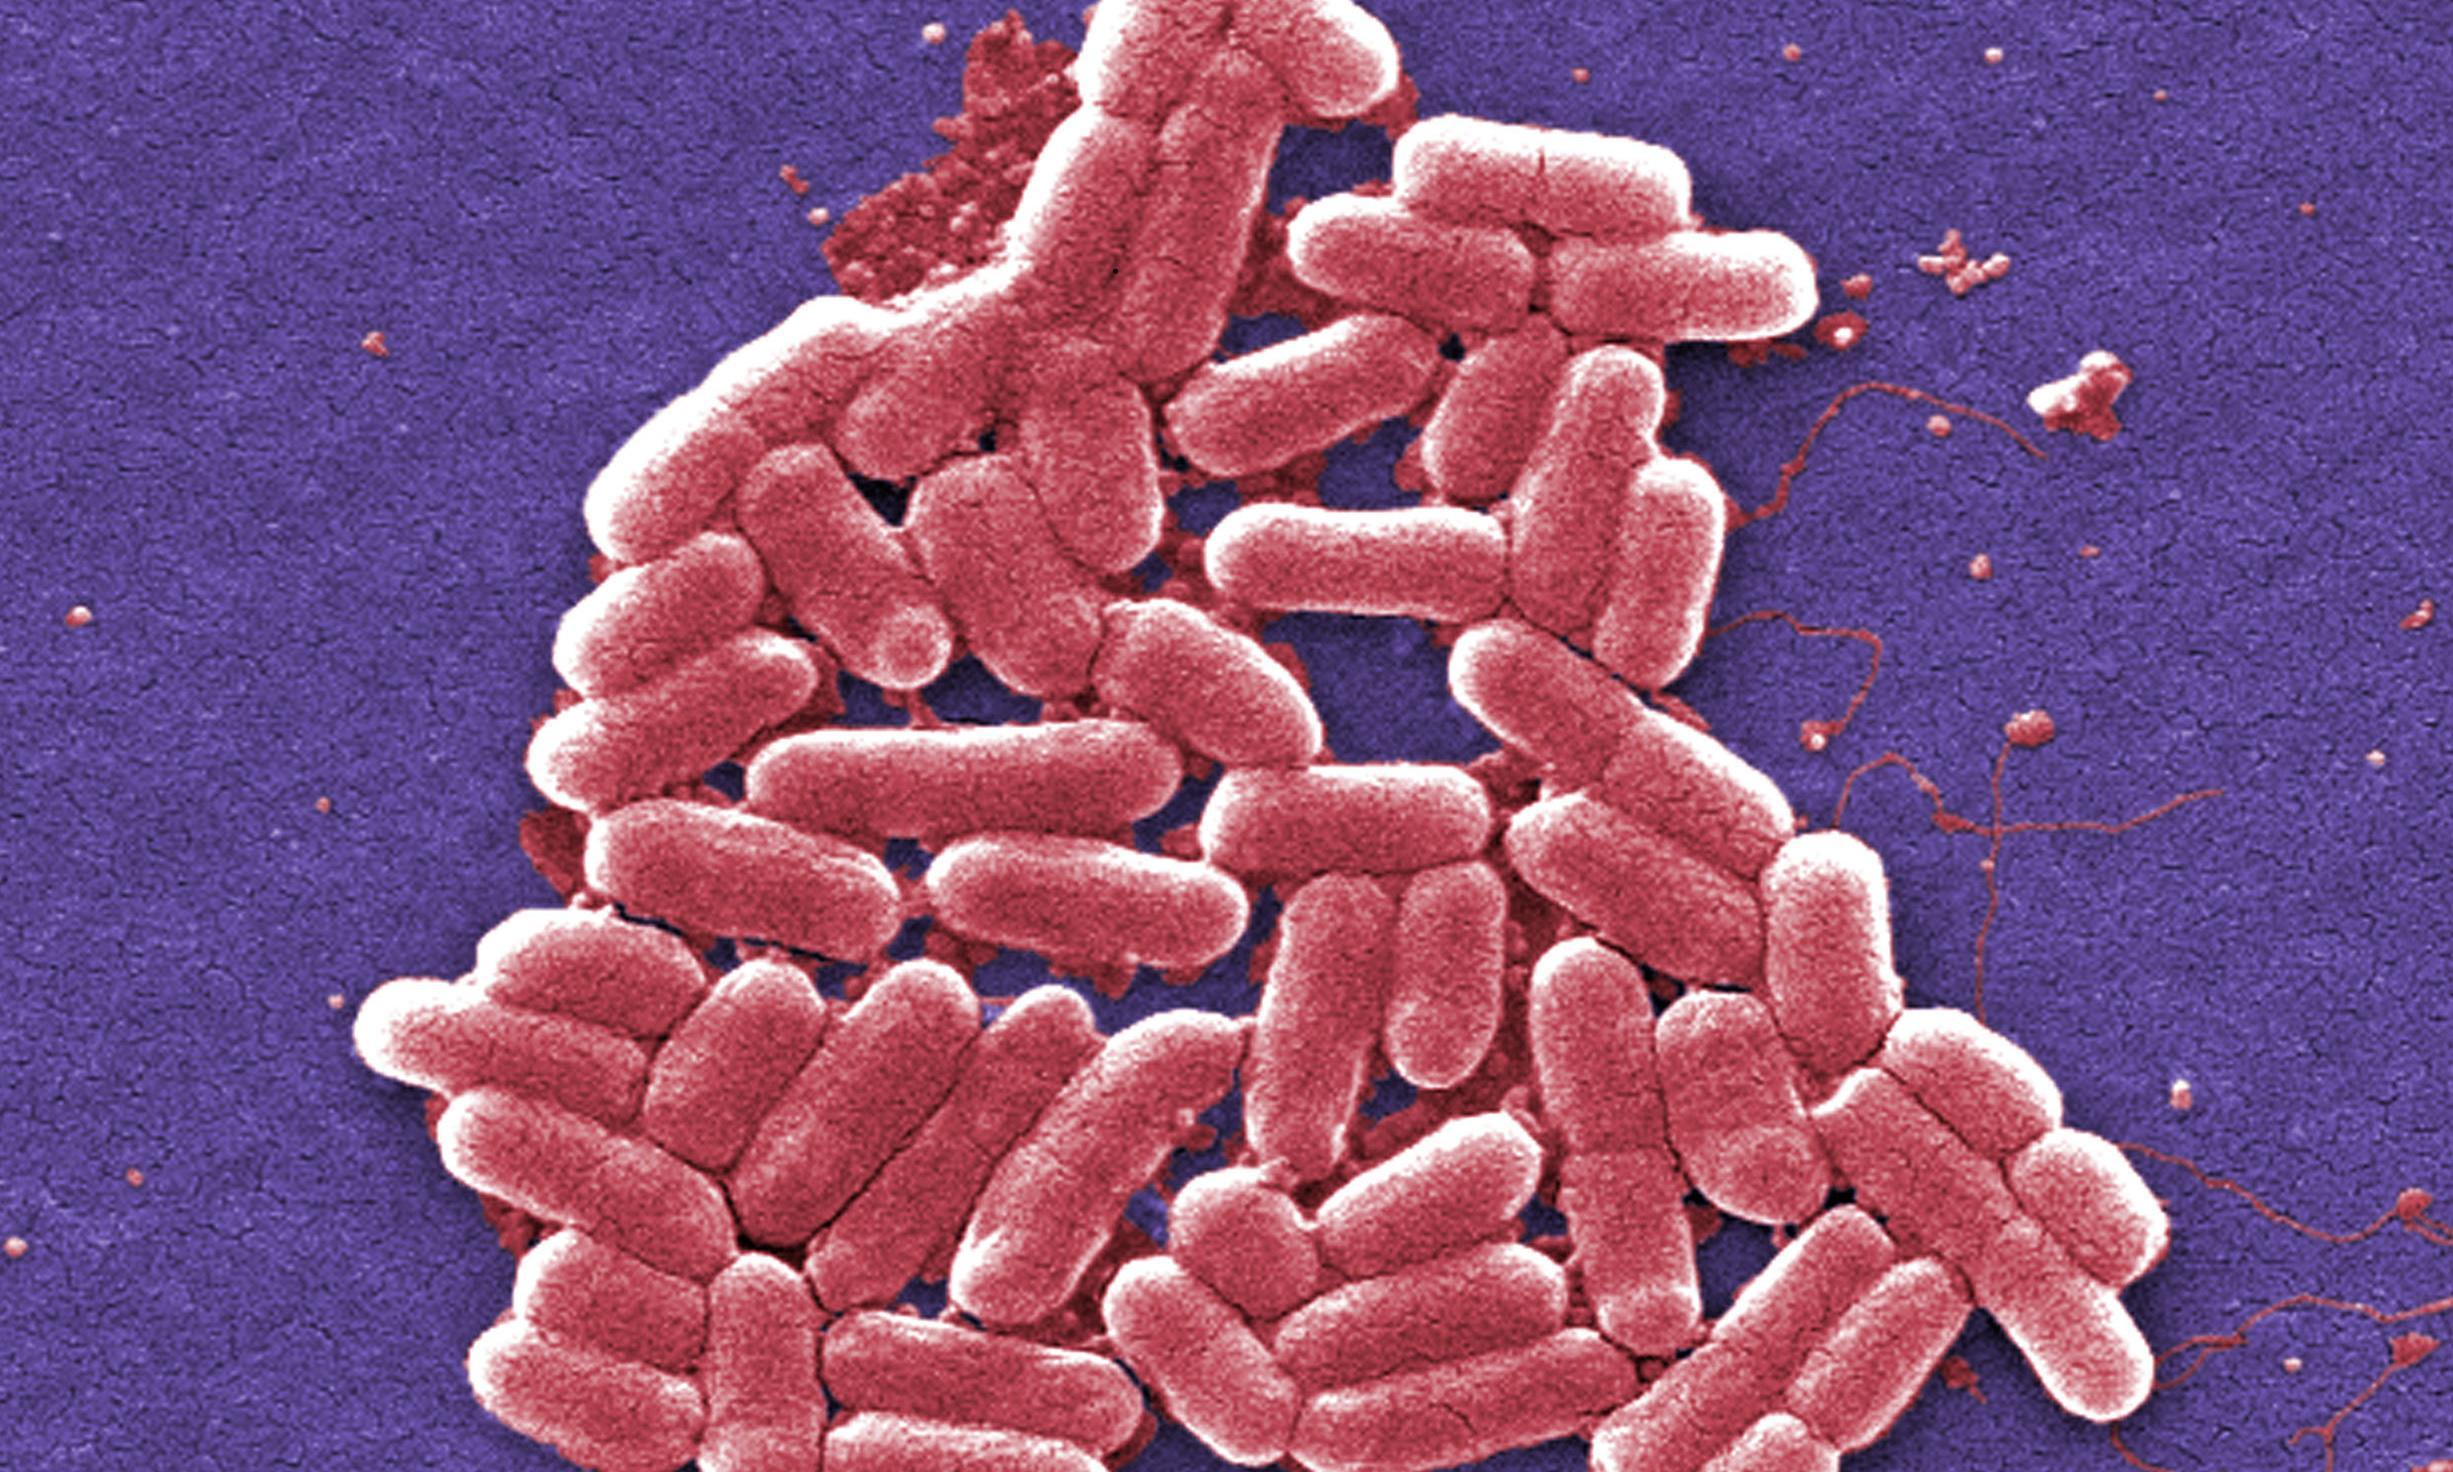 'Living medicine' helps make toxic ammonia breakthrough